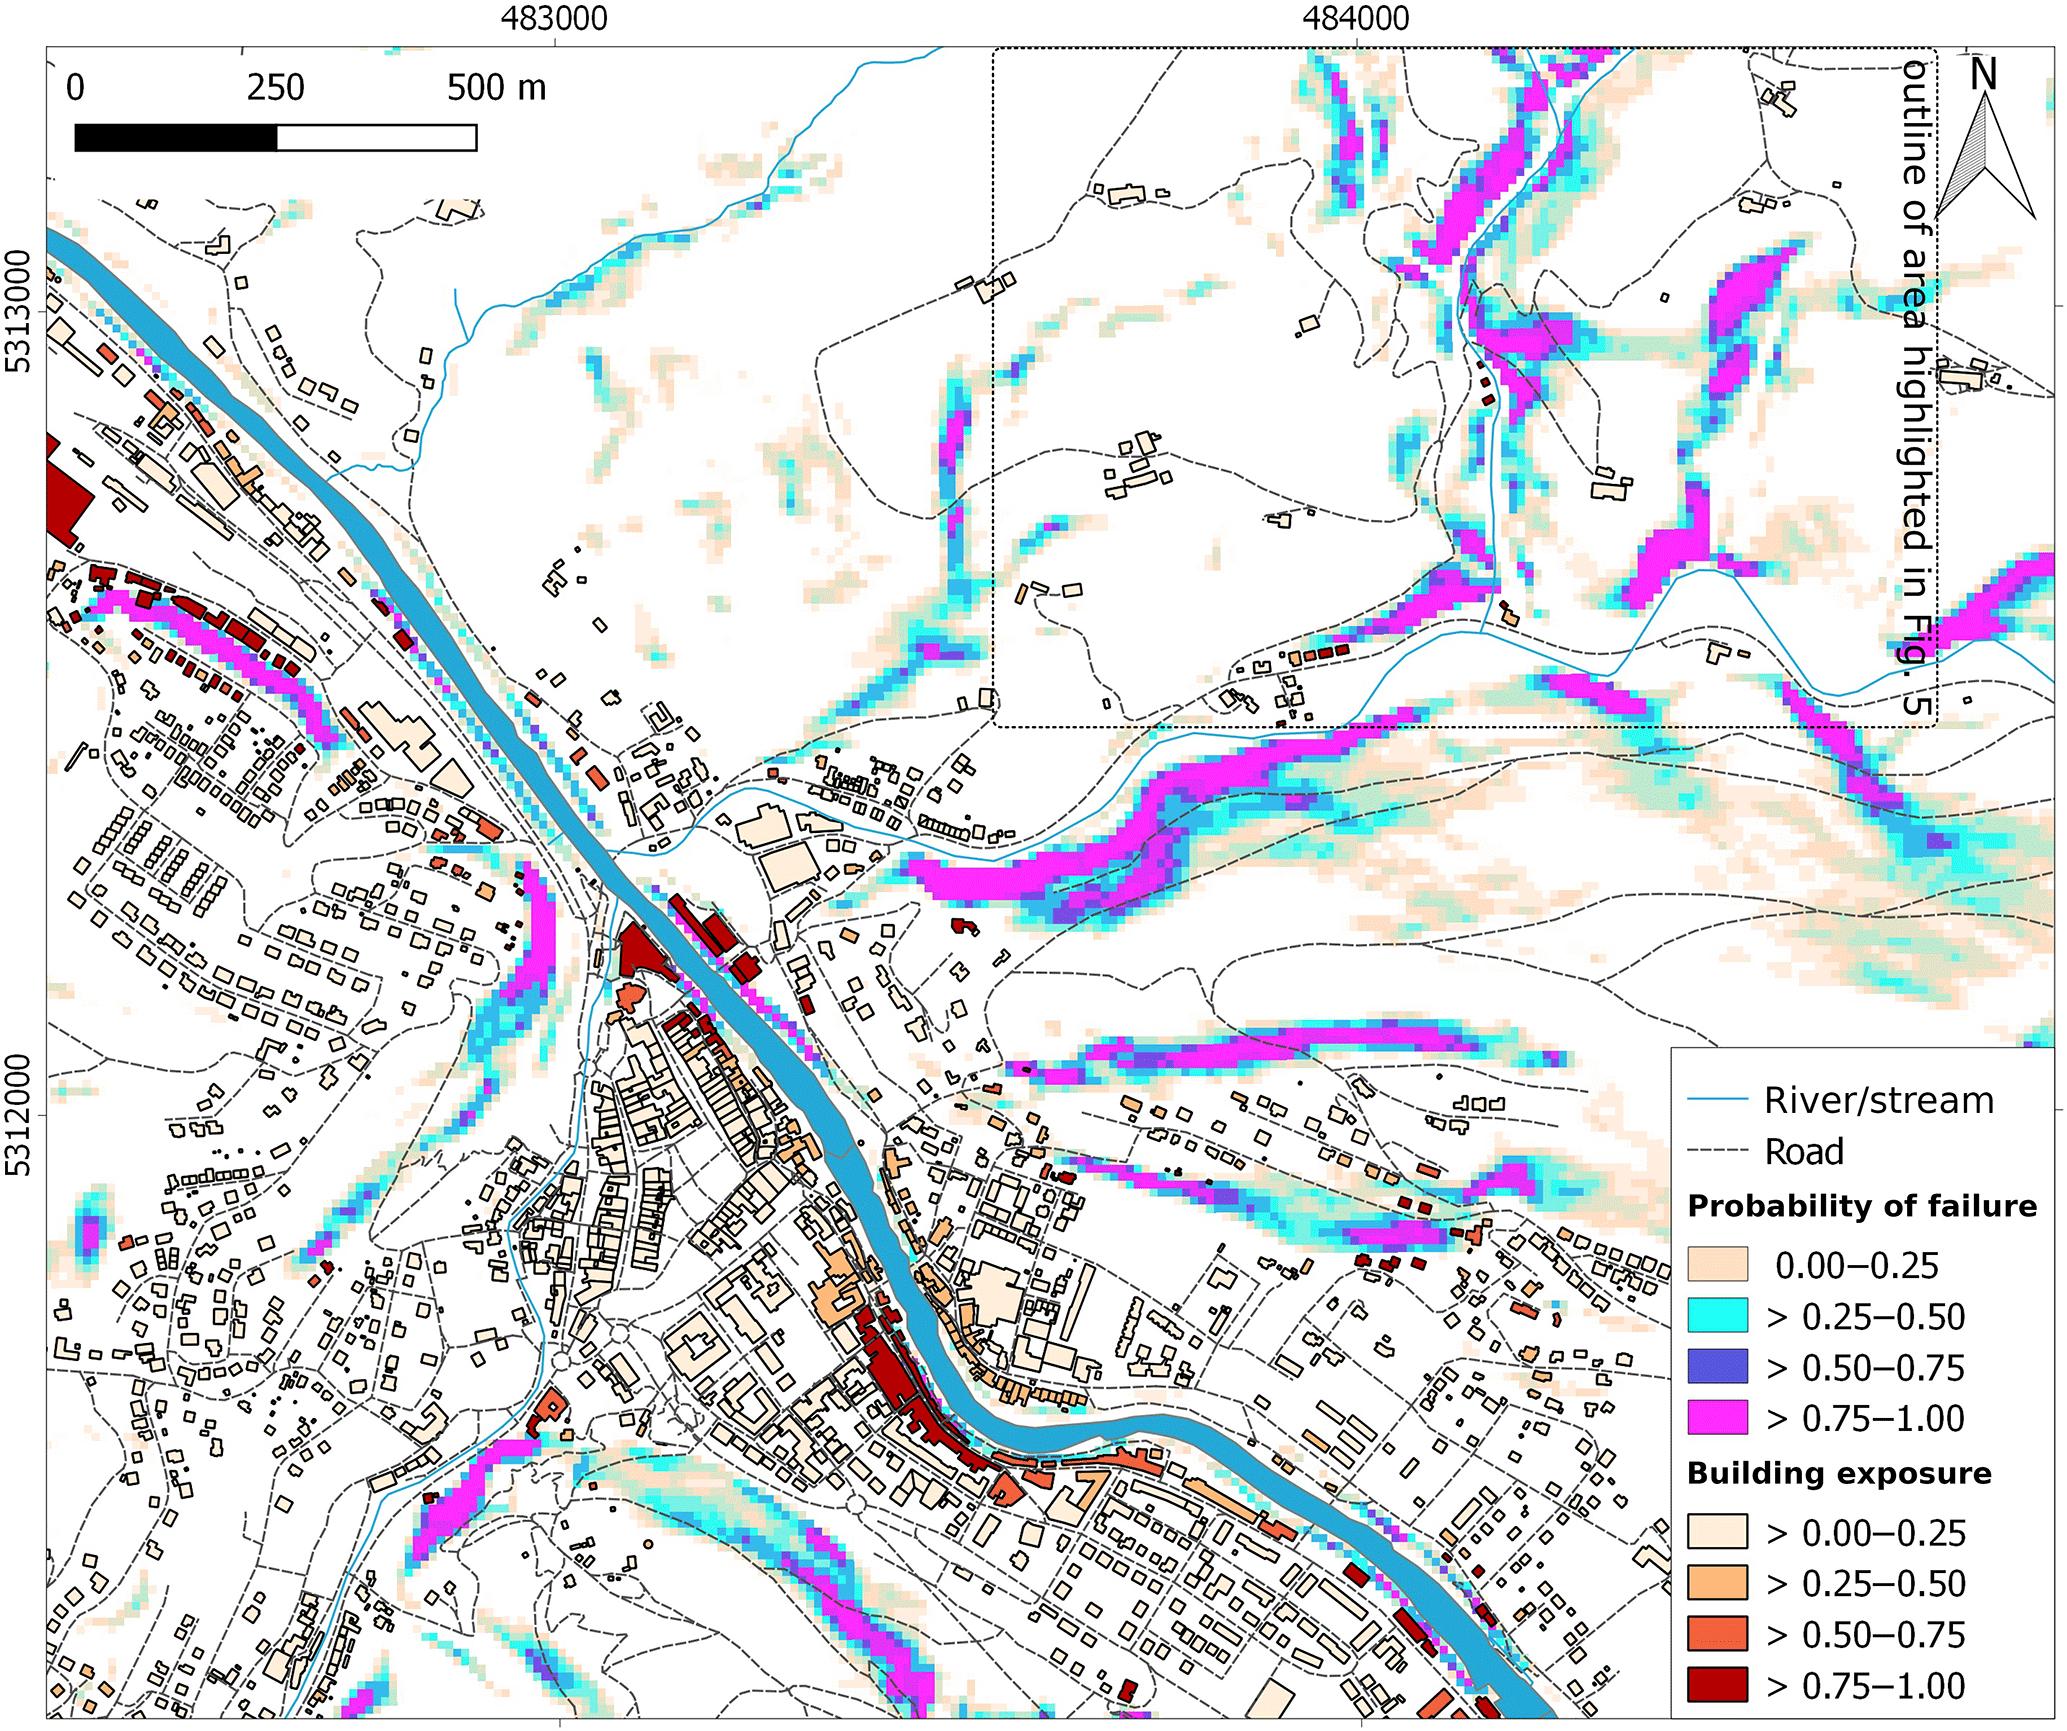 NHESS - Probabilistic landslide ensemble prediction systems